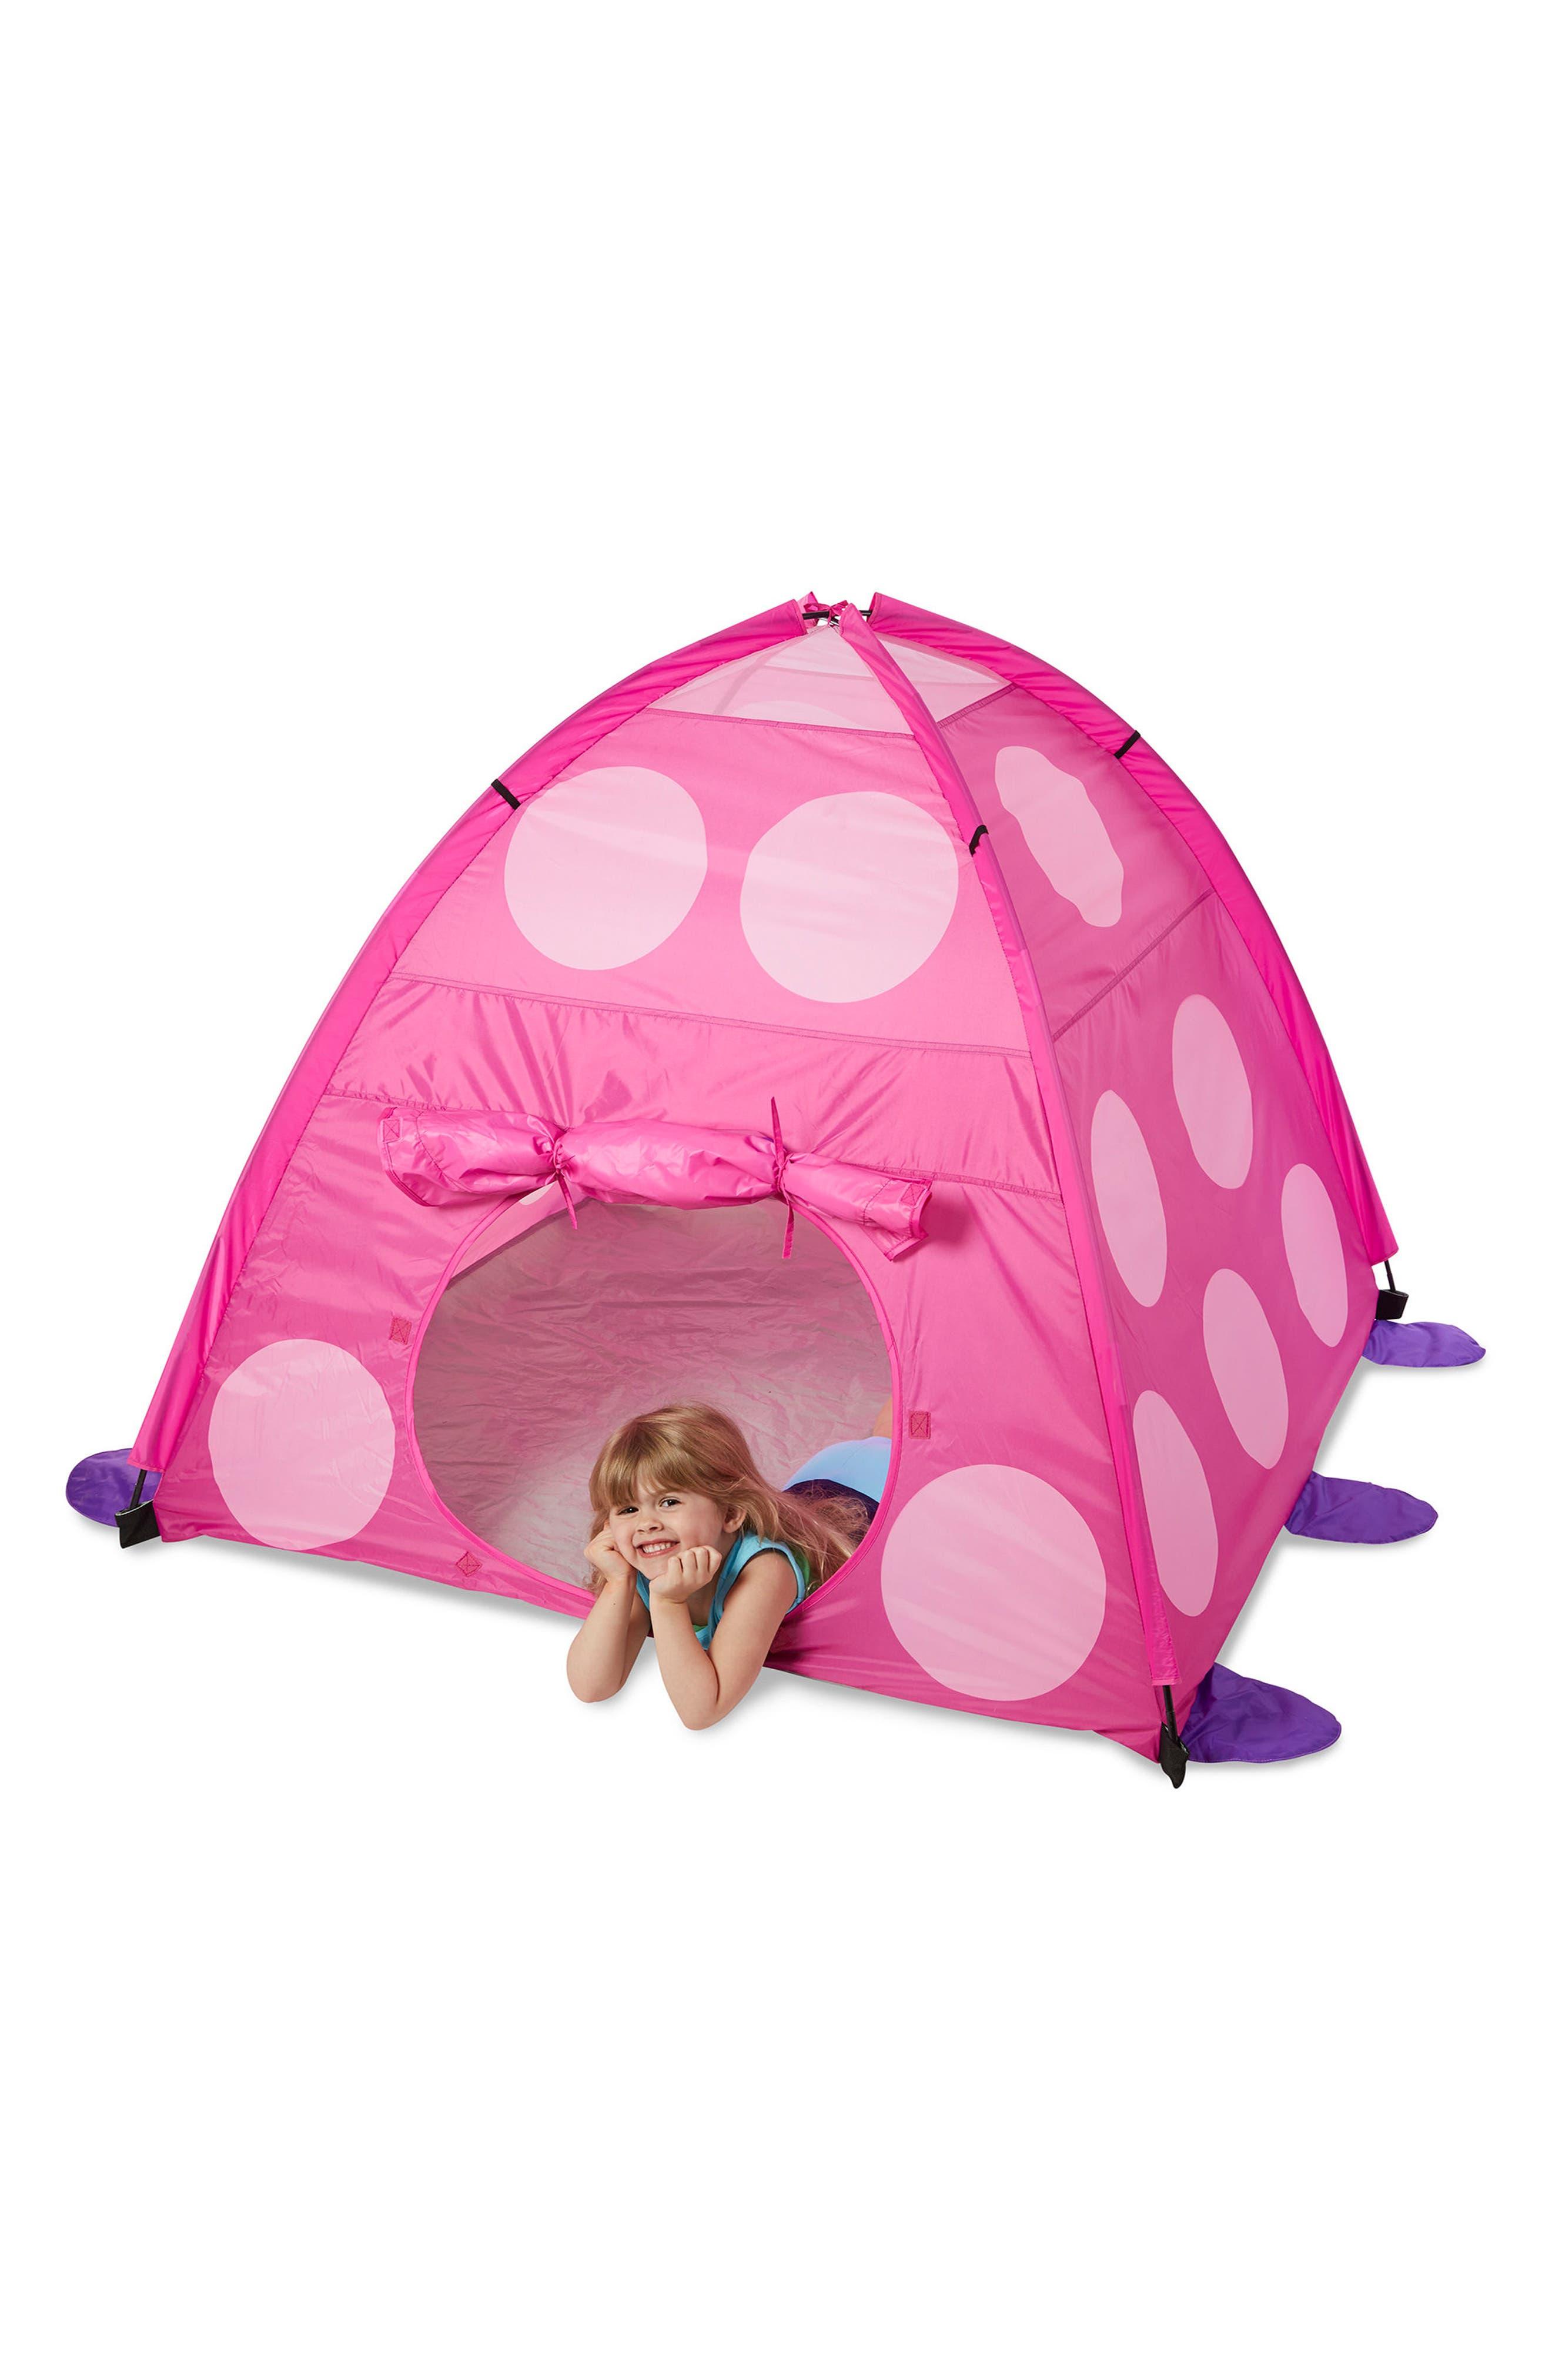 Trixie Ladybug Tent,                             Alternate thumbnail 3, color,                             650